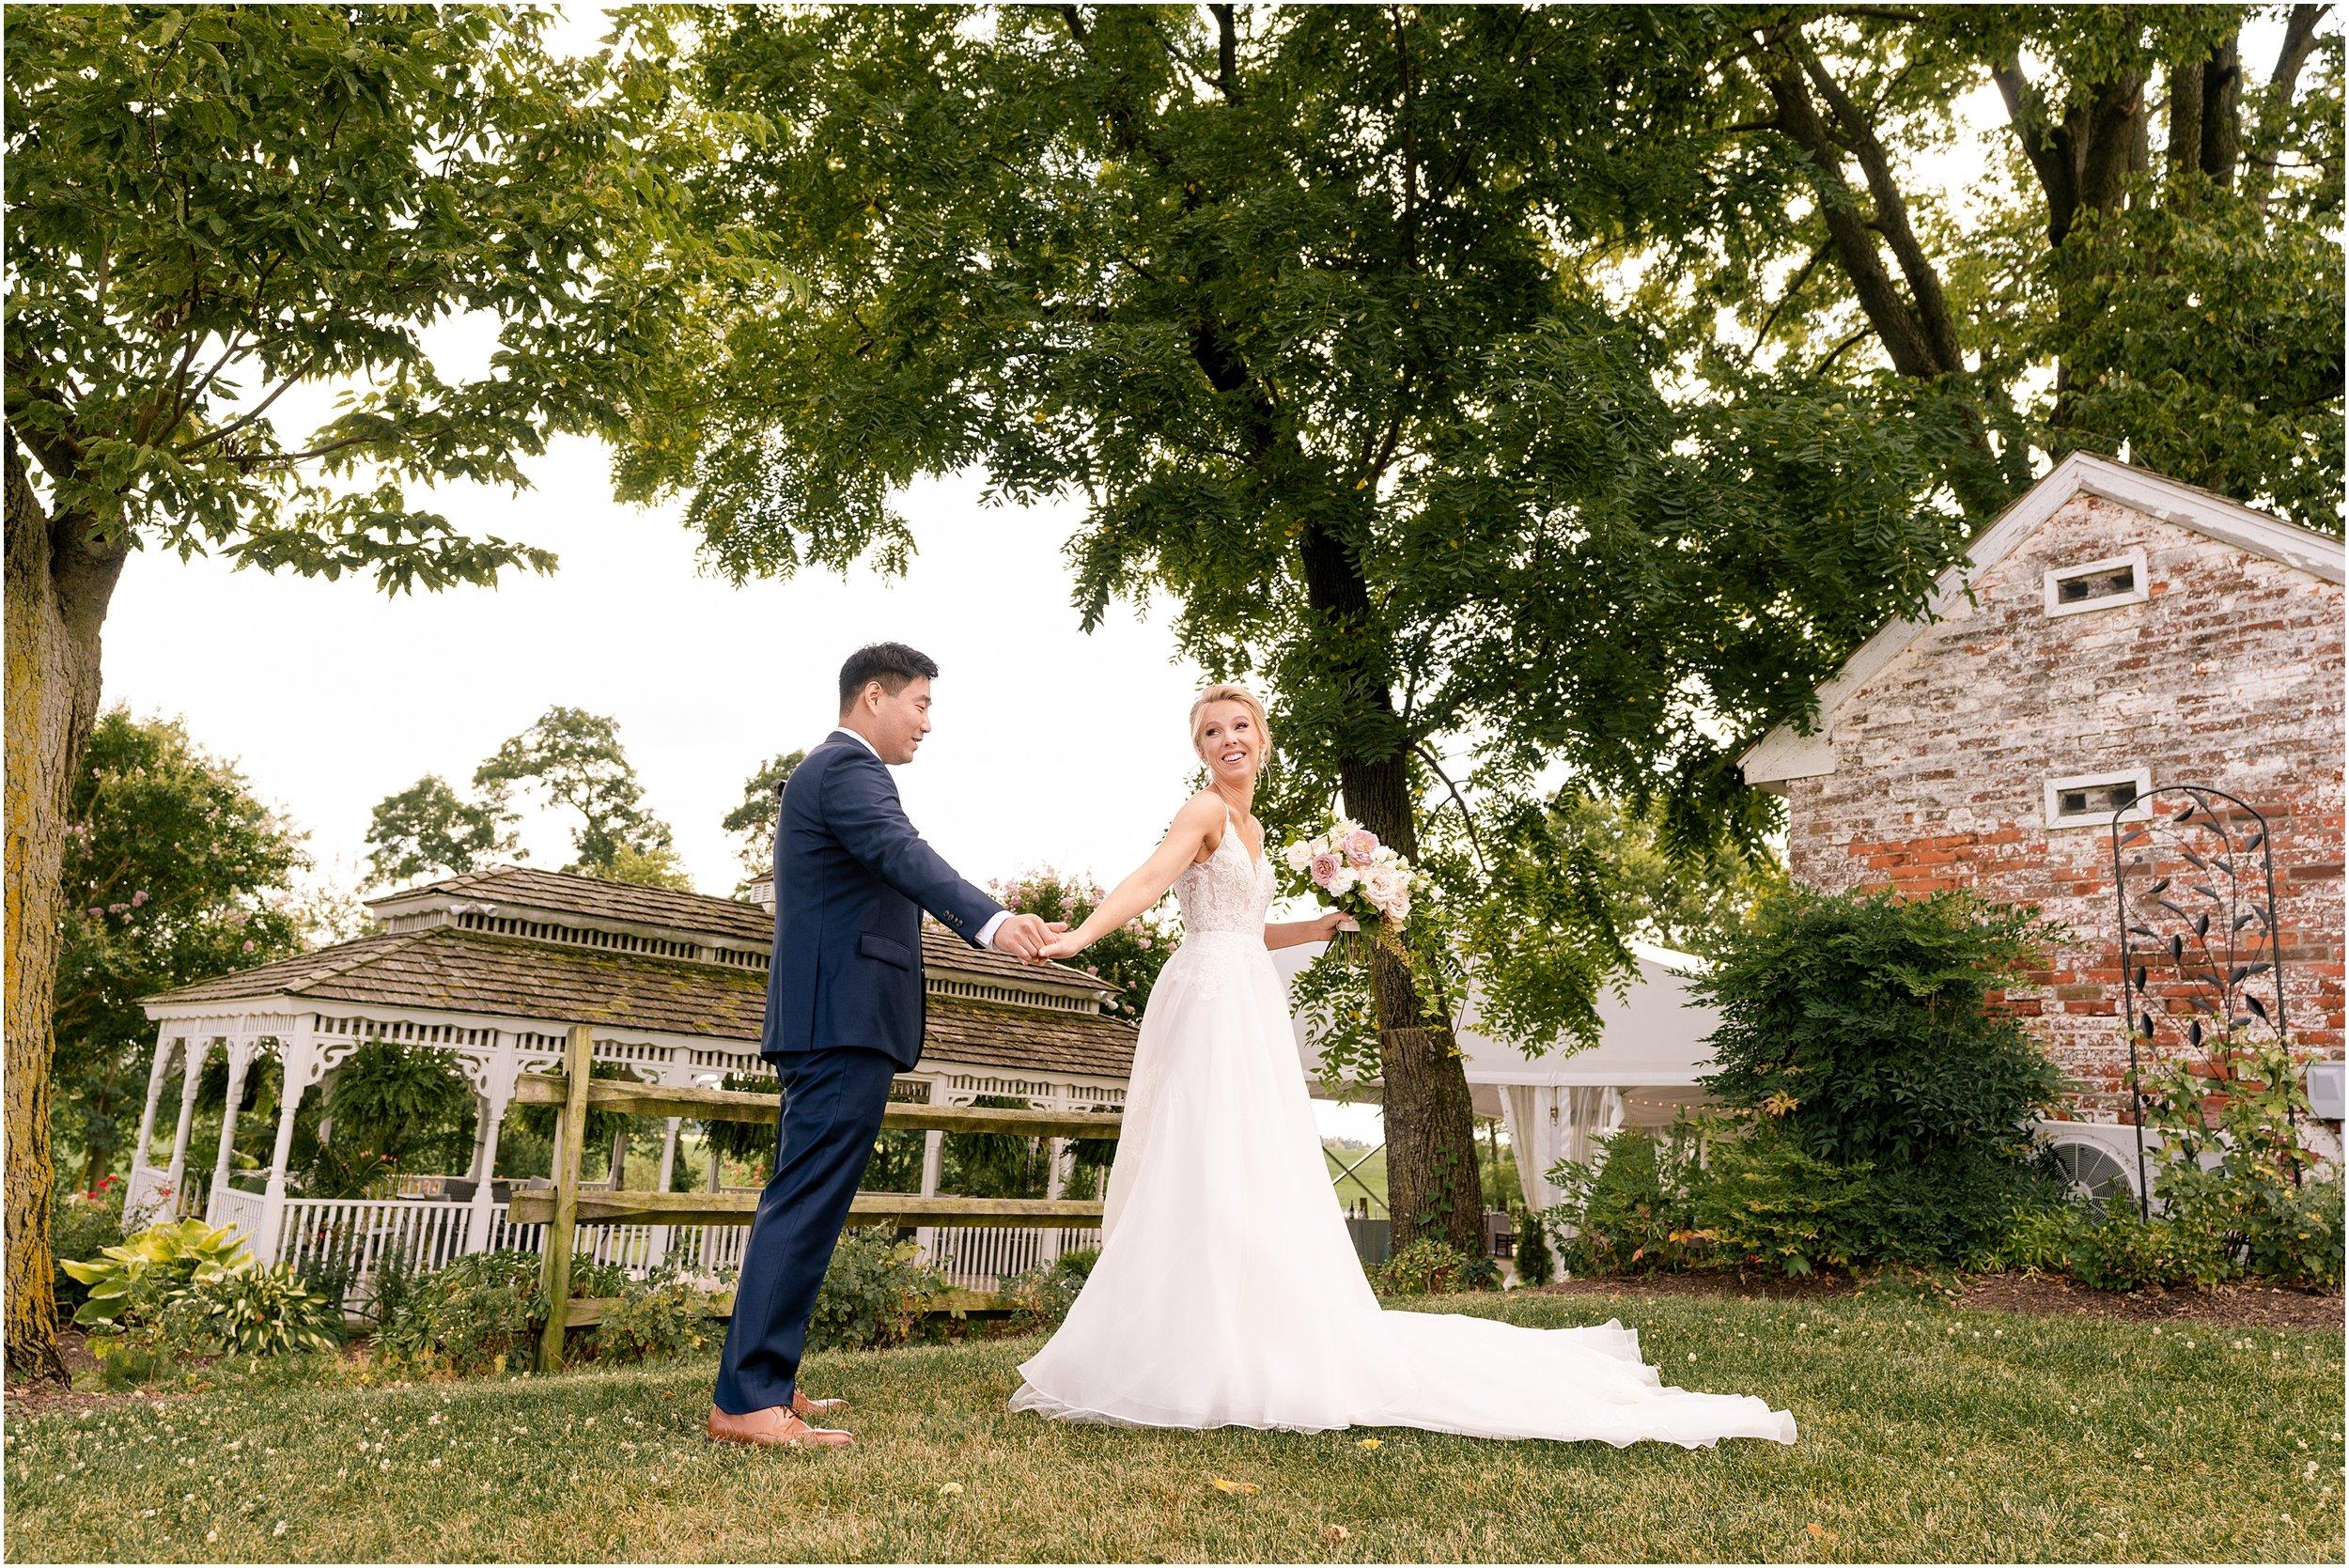 hannah leigh photography Walkers Overlook Wedding Walkersville MD_3585.jpg